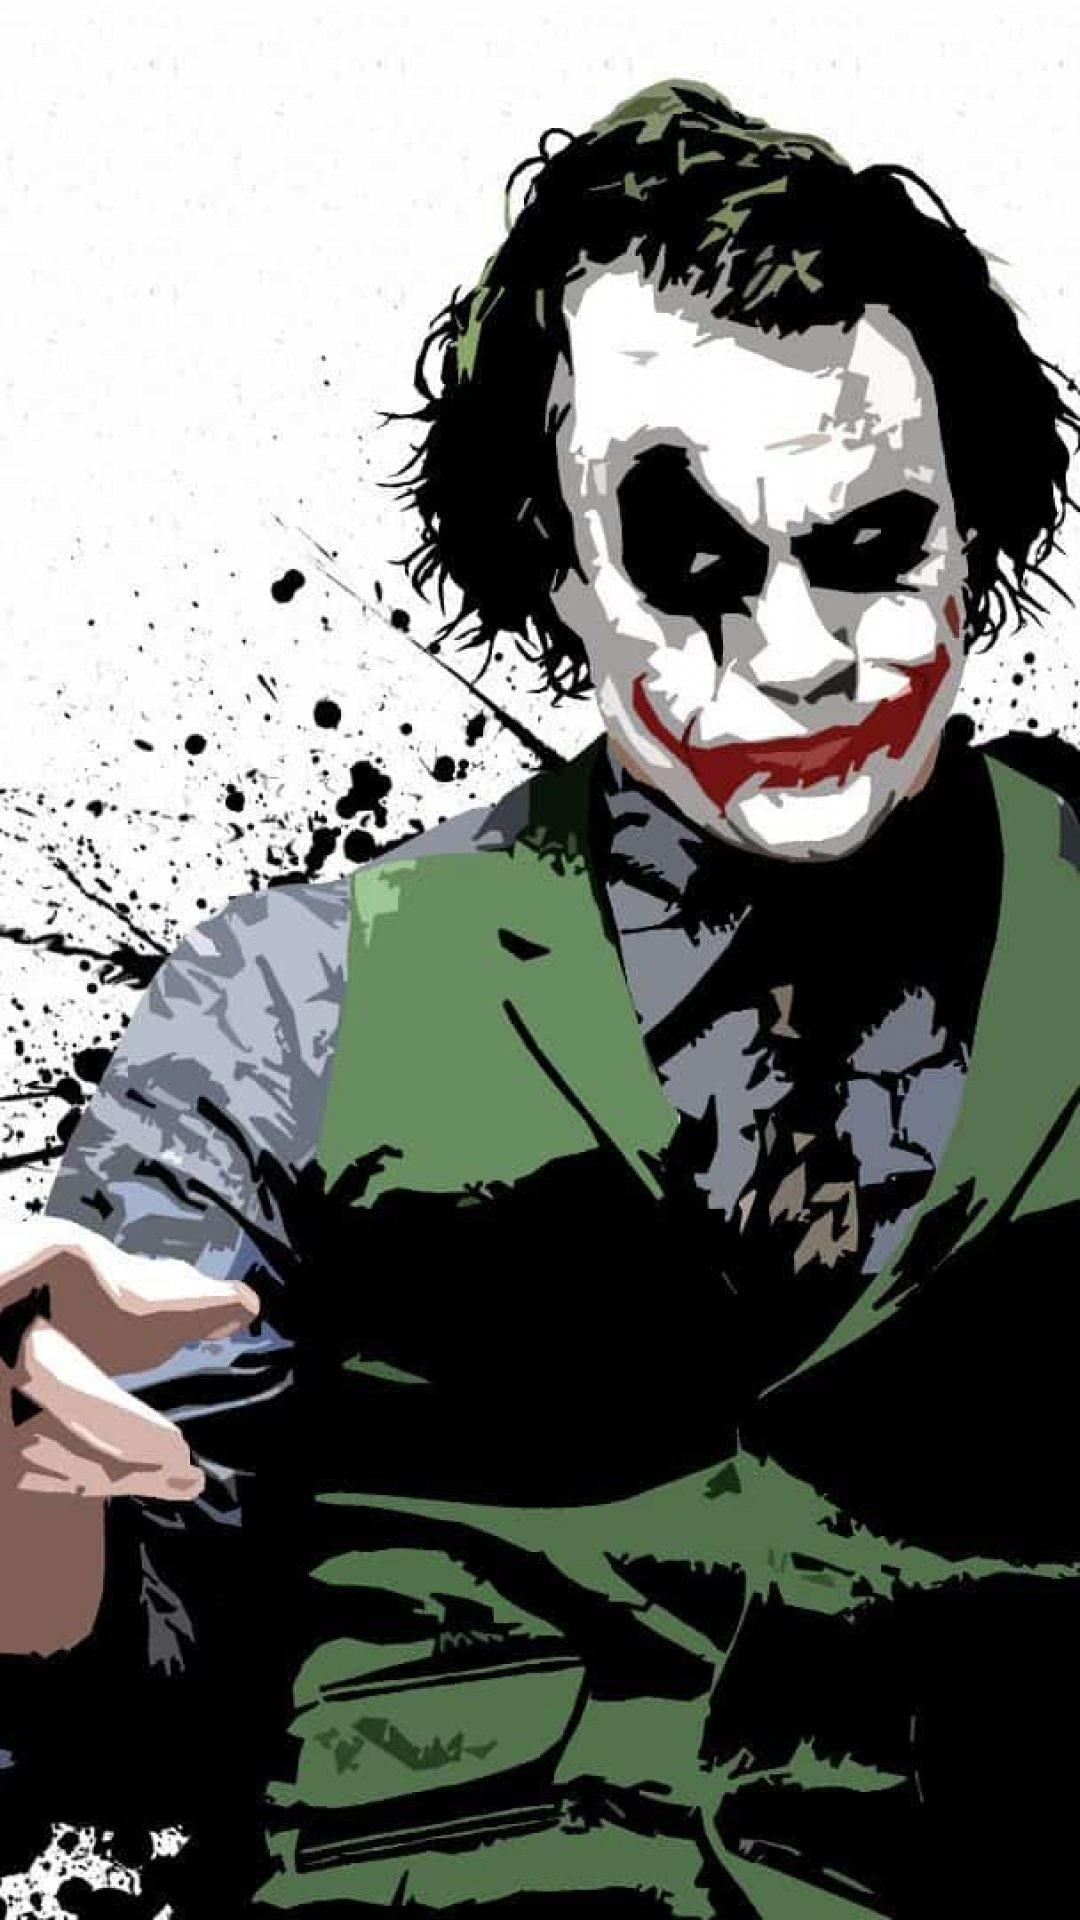 1080x1920 batman joker wallpaper hd